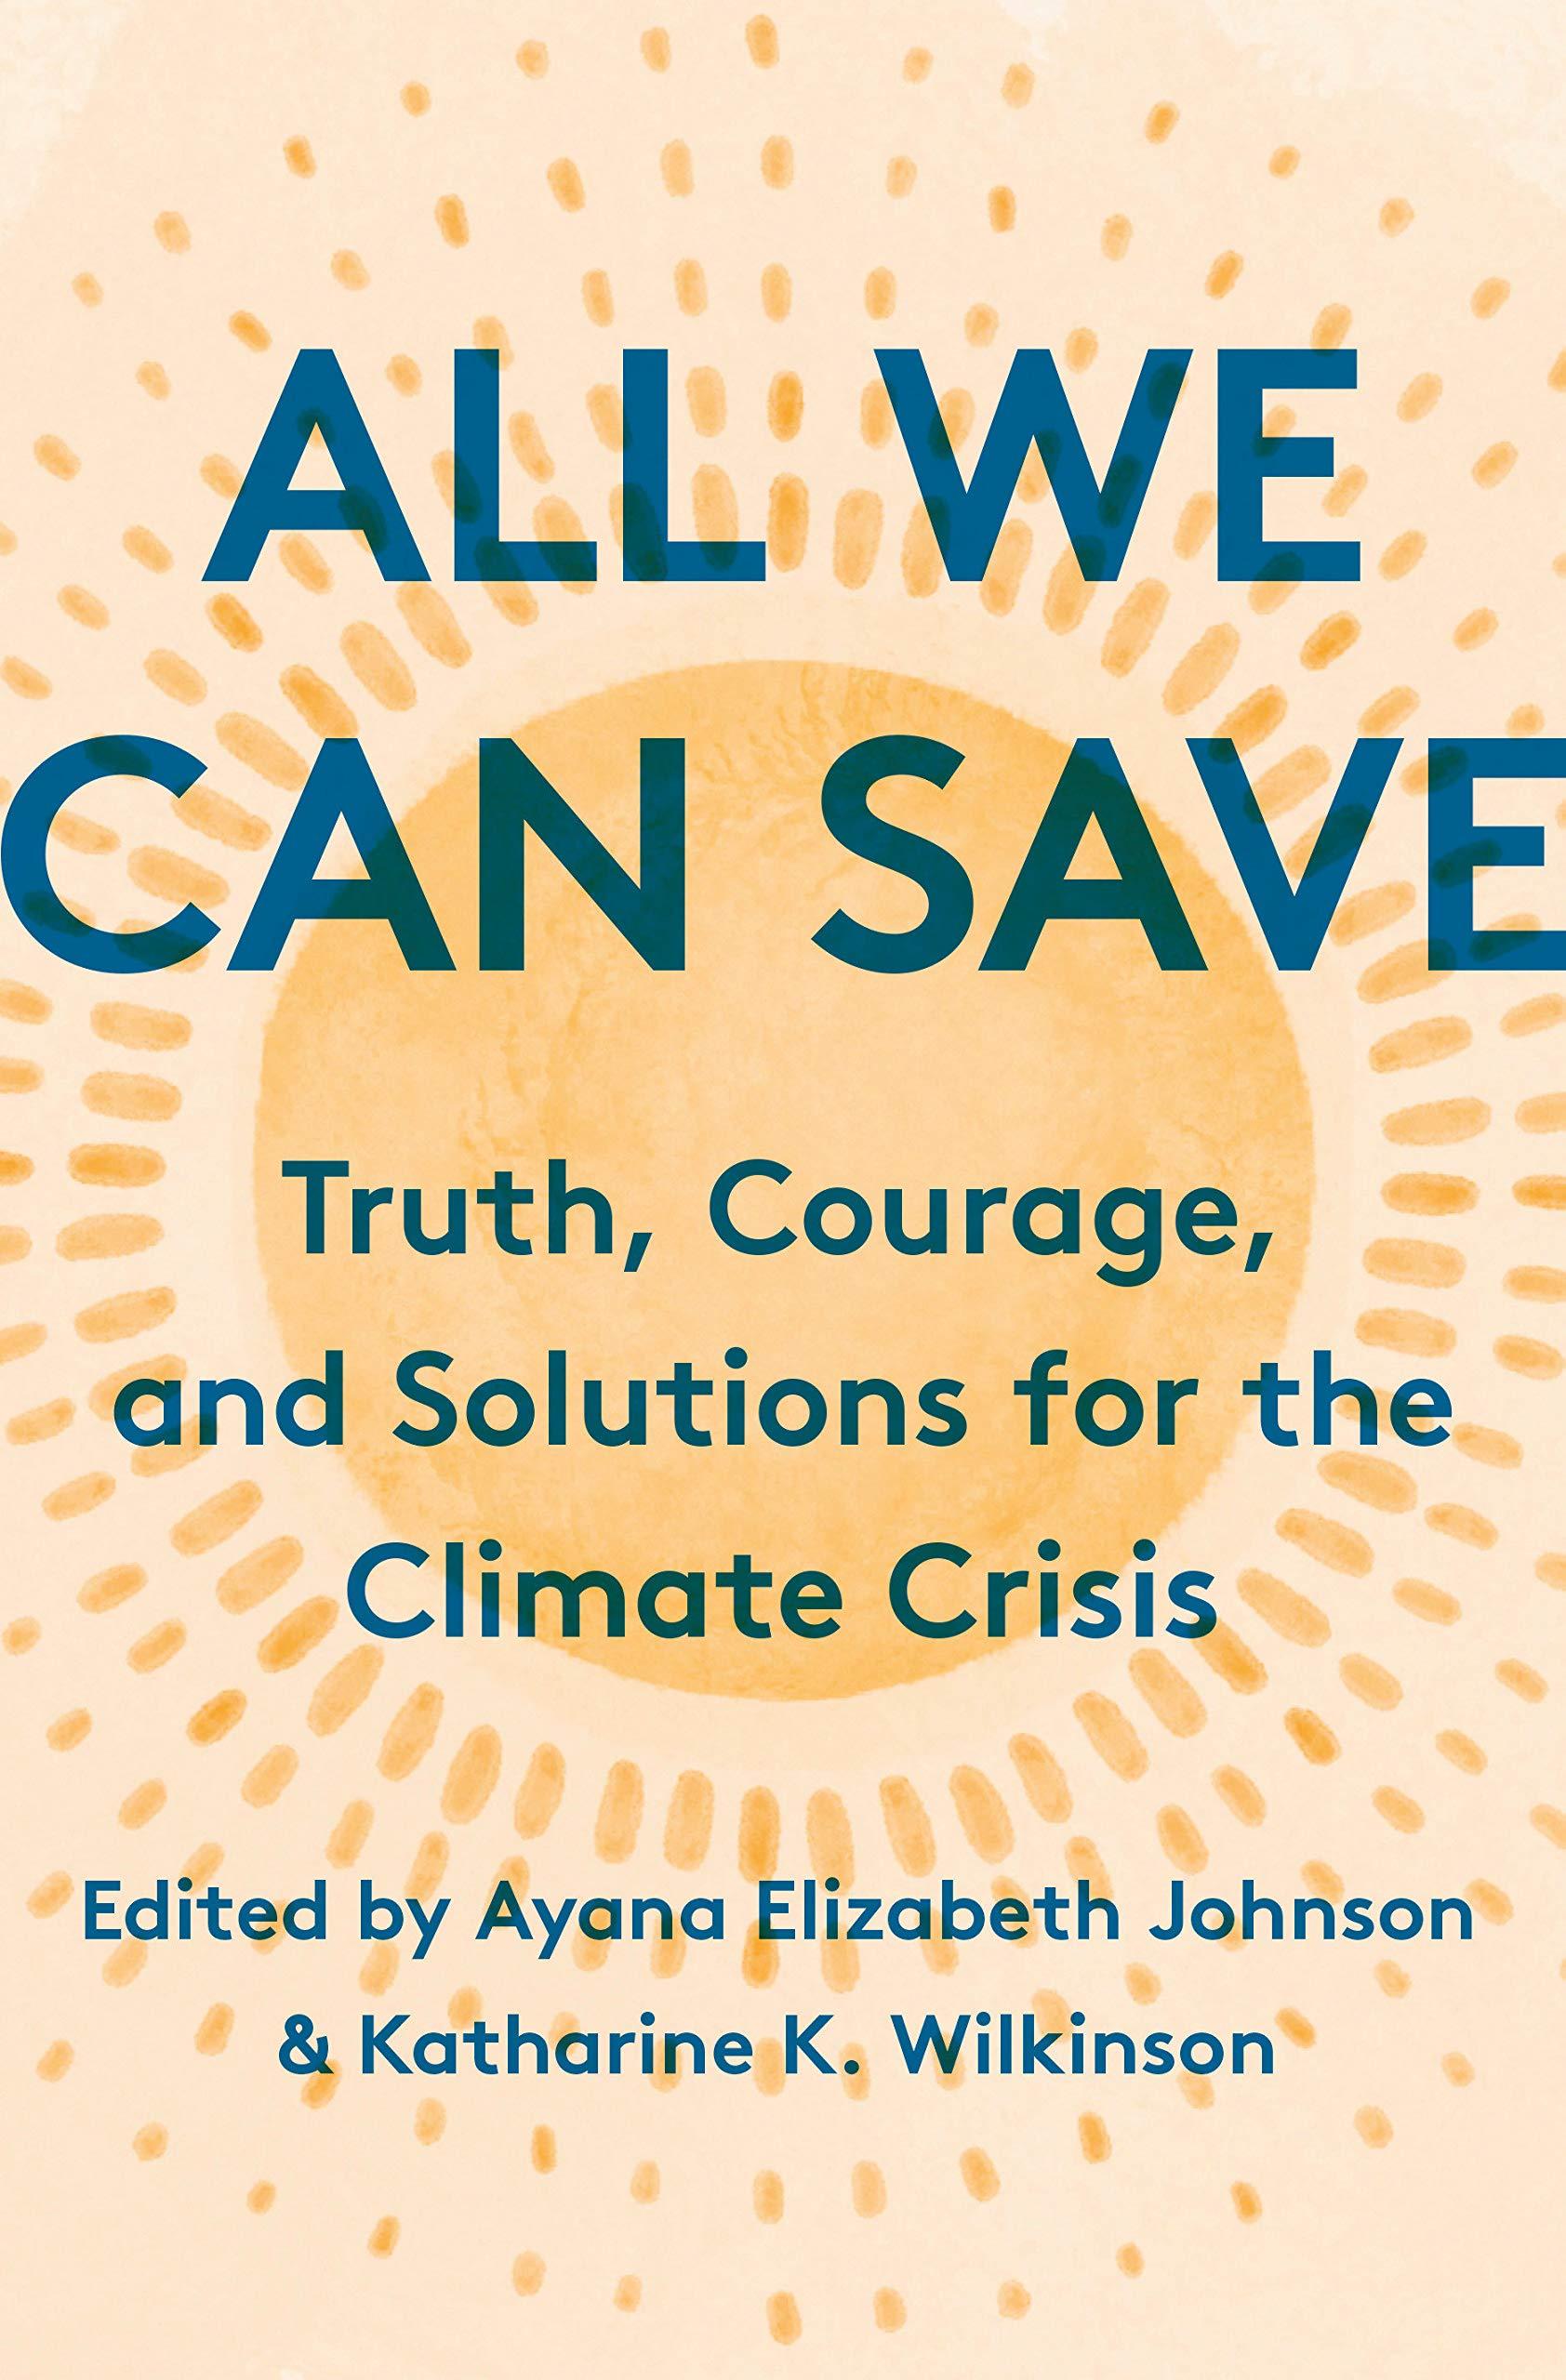 all we can save ayana elizabeth johnson katharine k. wilkinson | paradise found santa barbara